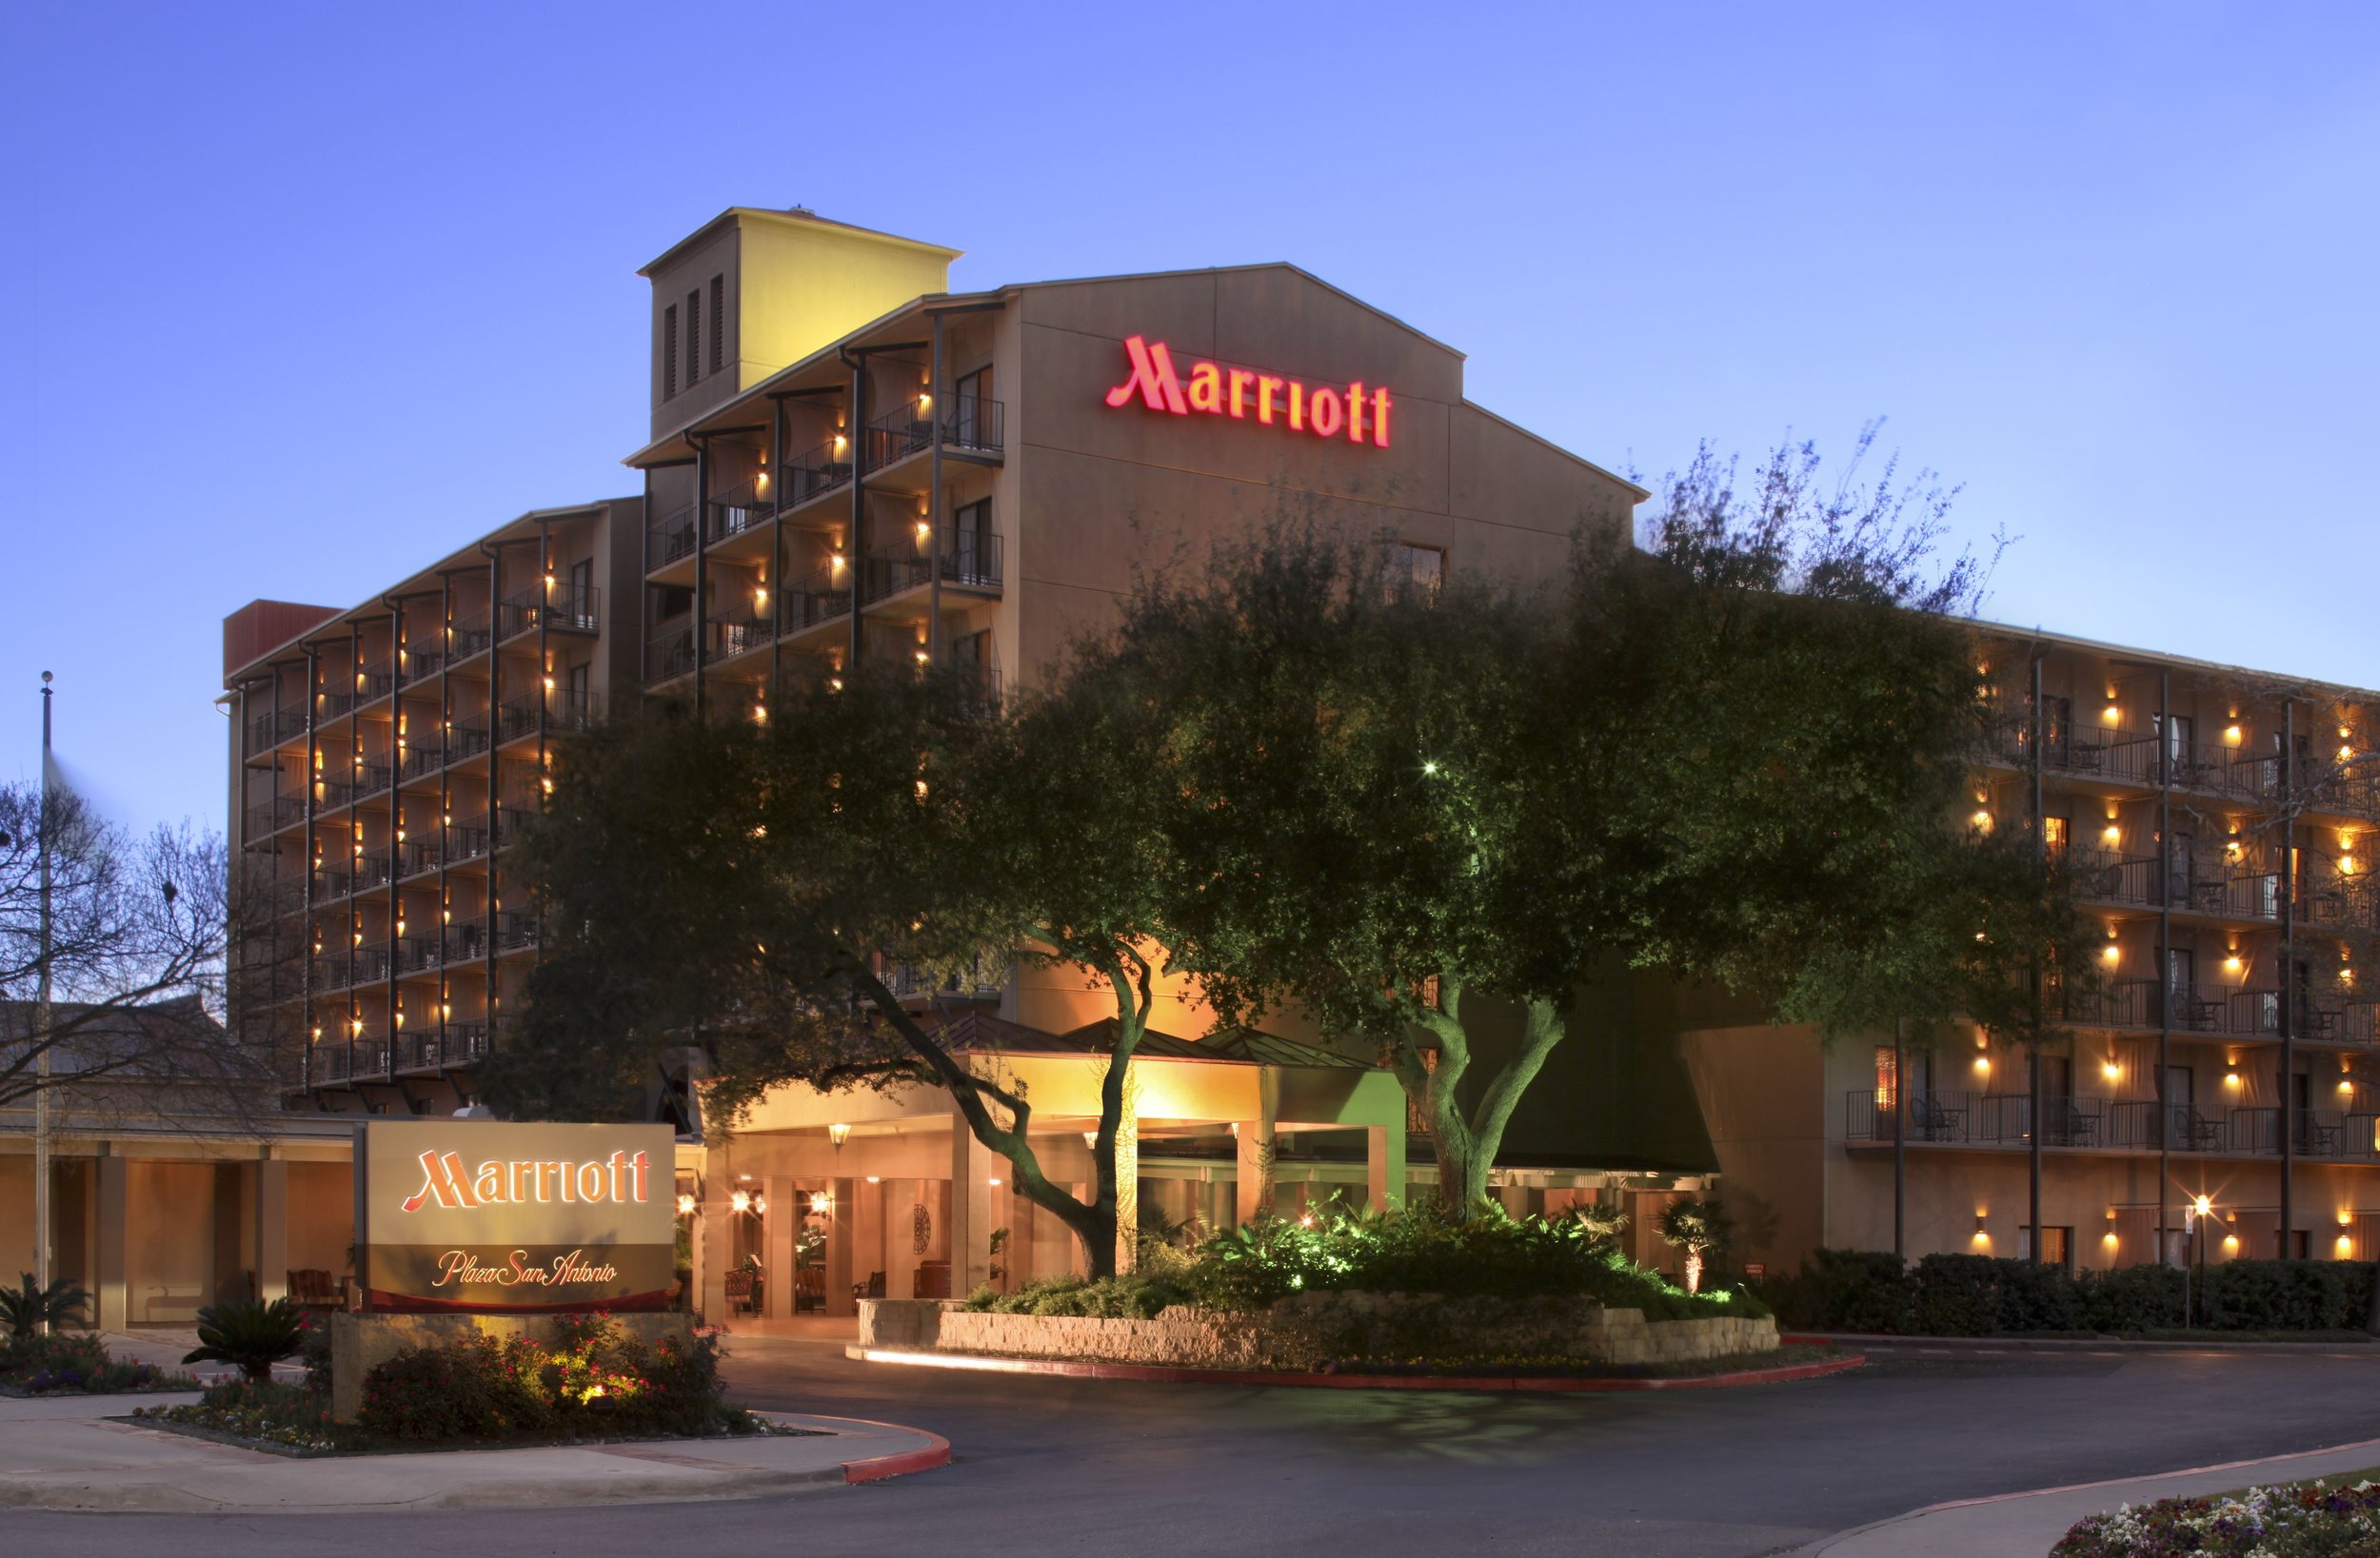 Marriott Plaza San Antonio